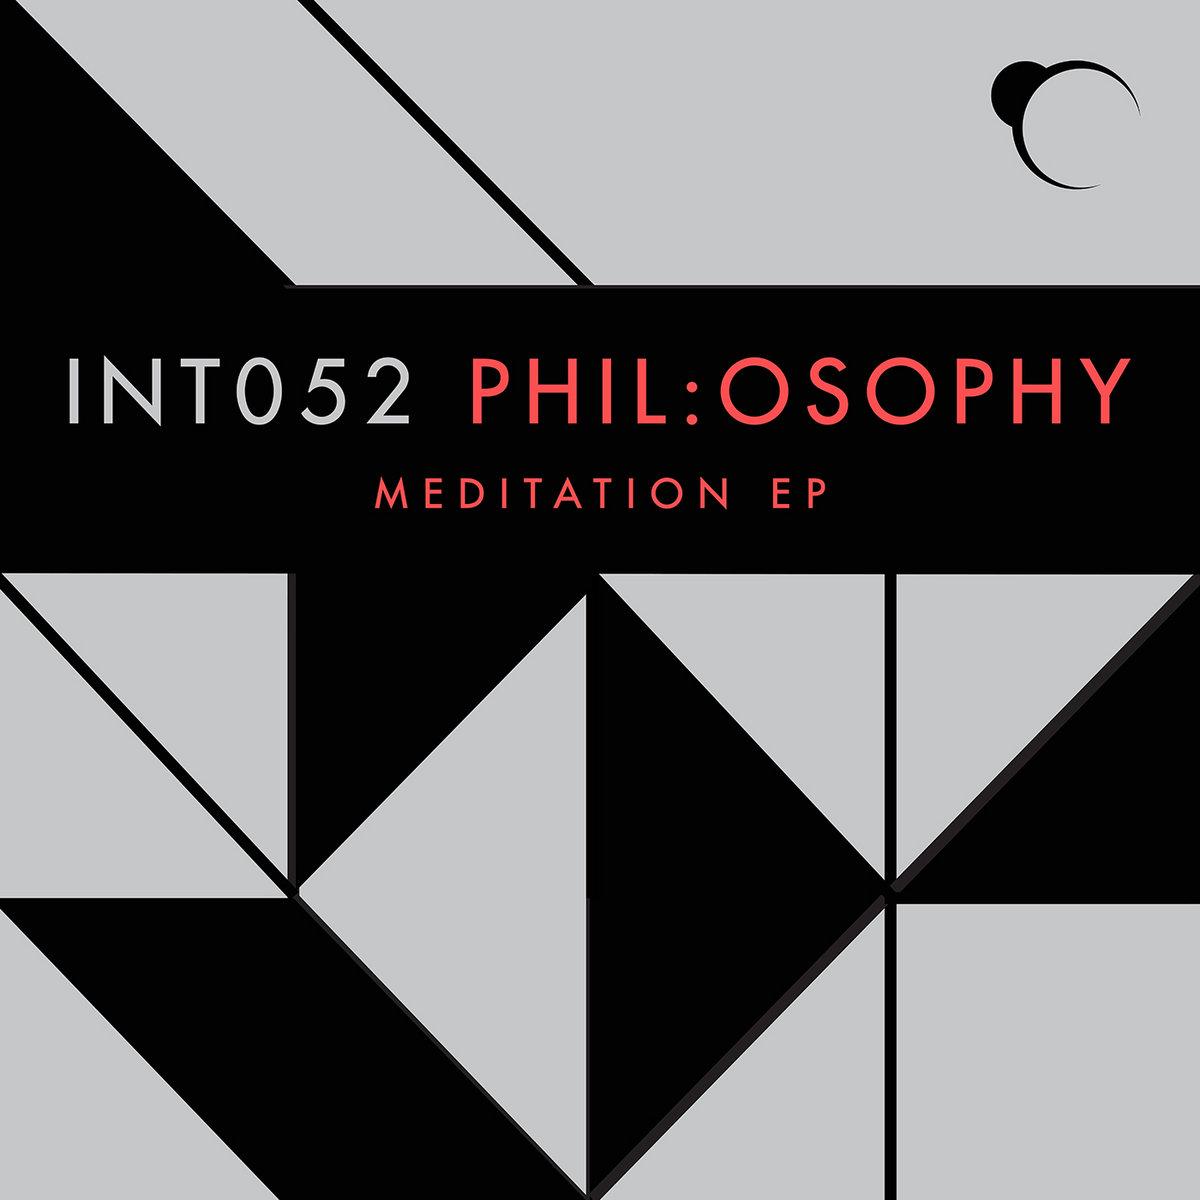 INT052 - Meditation EP | Integral Records